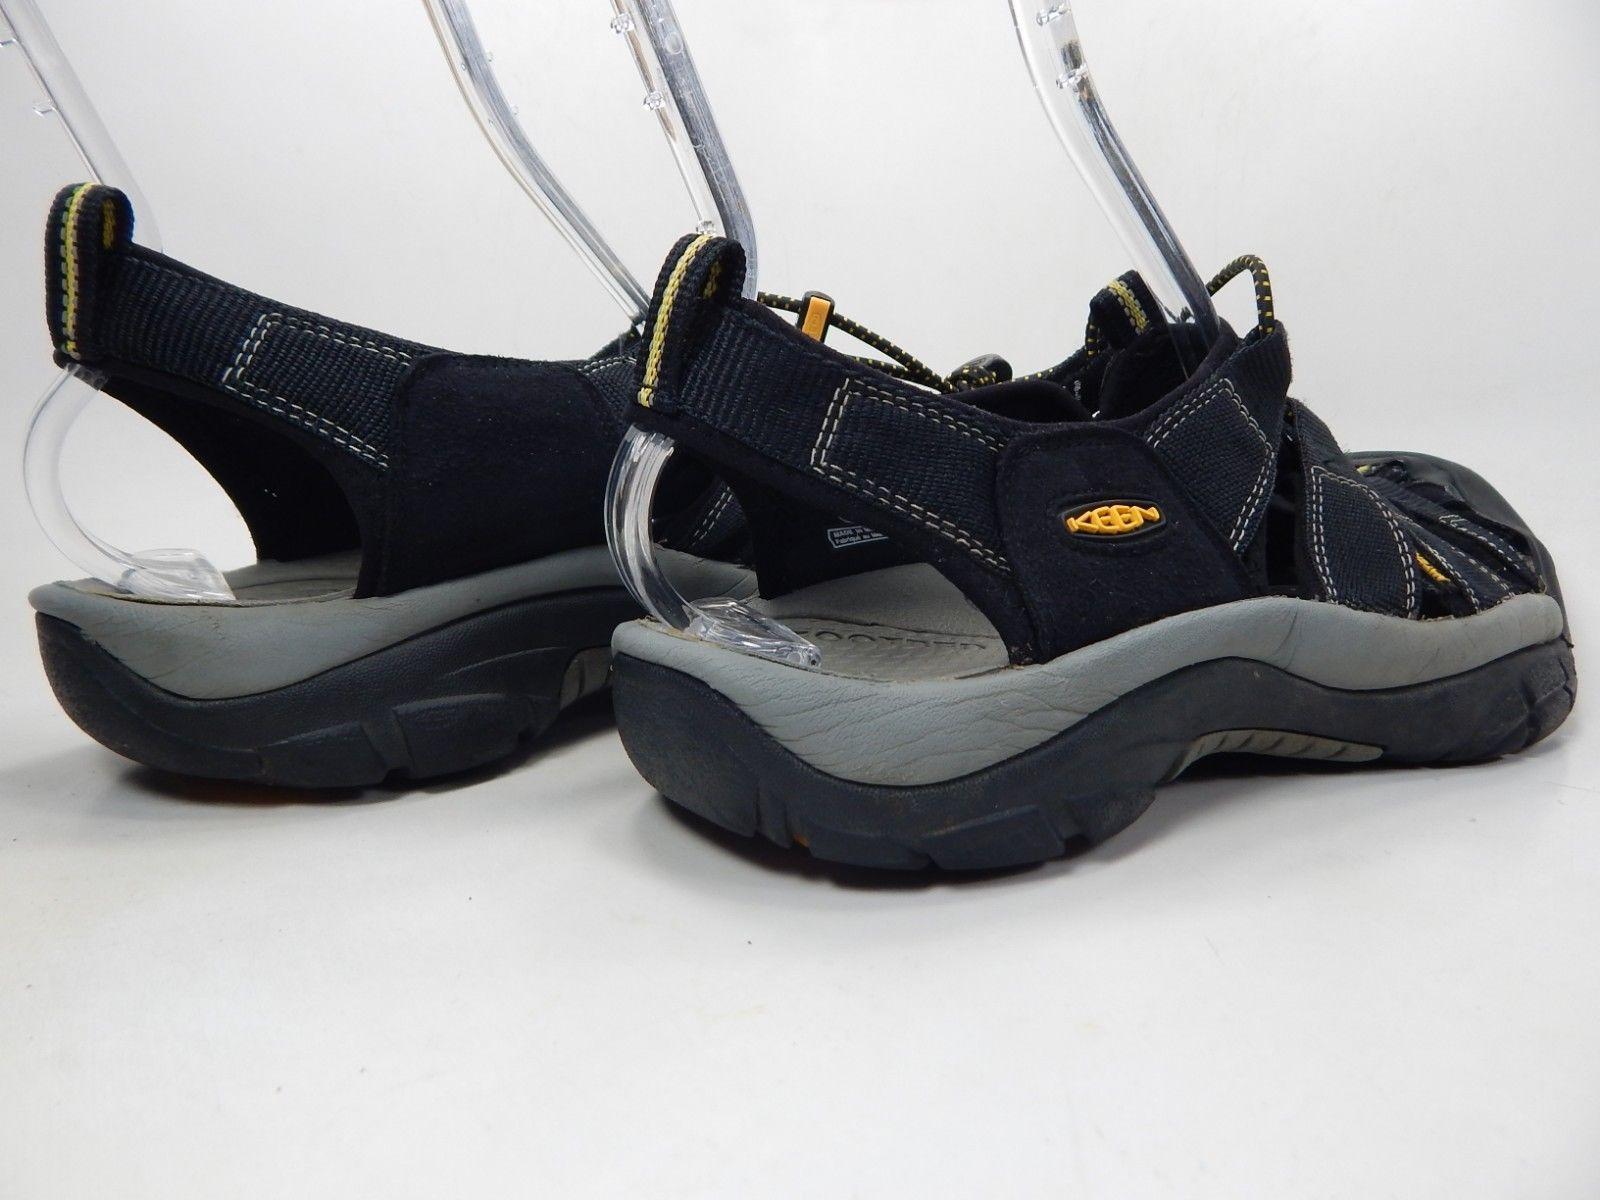 Keen Newport H2 Size US 11.5 M (D) EU 45 Men's Sport Sandals Shoes Black 1001907